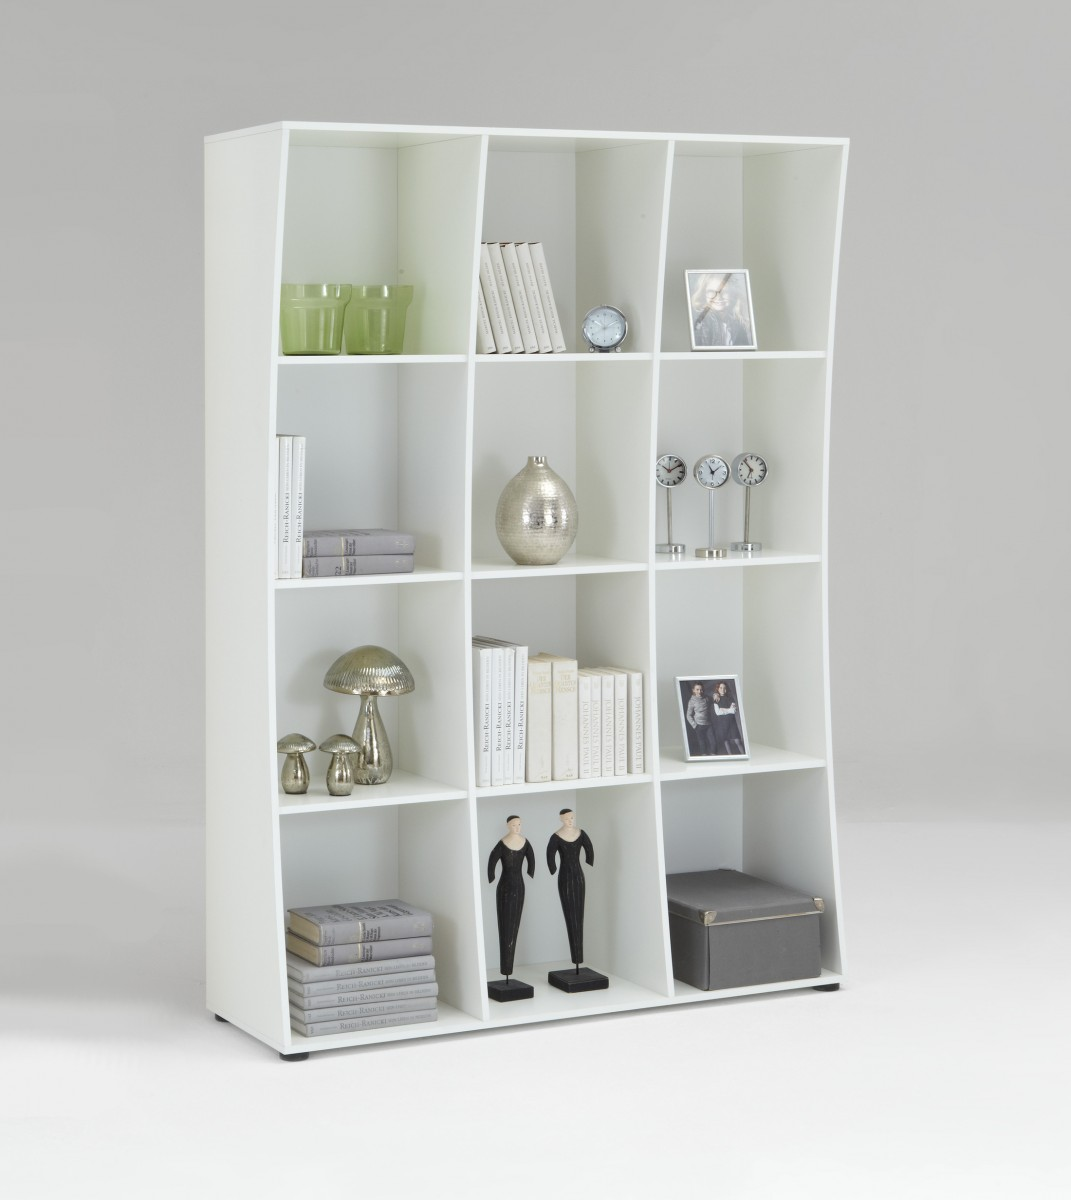 Regal weiß design  Dreams4Home Regal Kuba II. Regalschrank Bücheregal Standregal Design ...